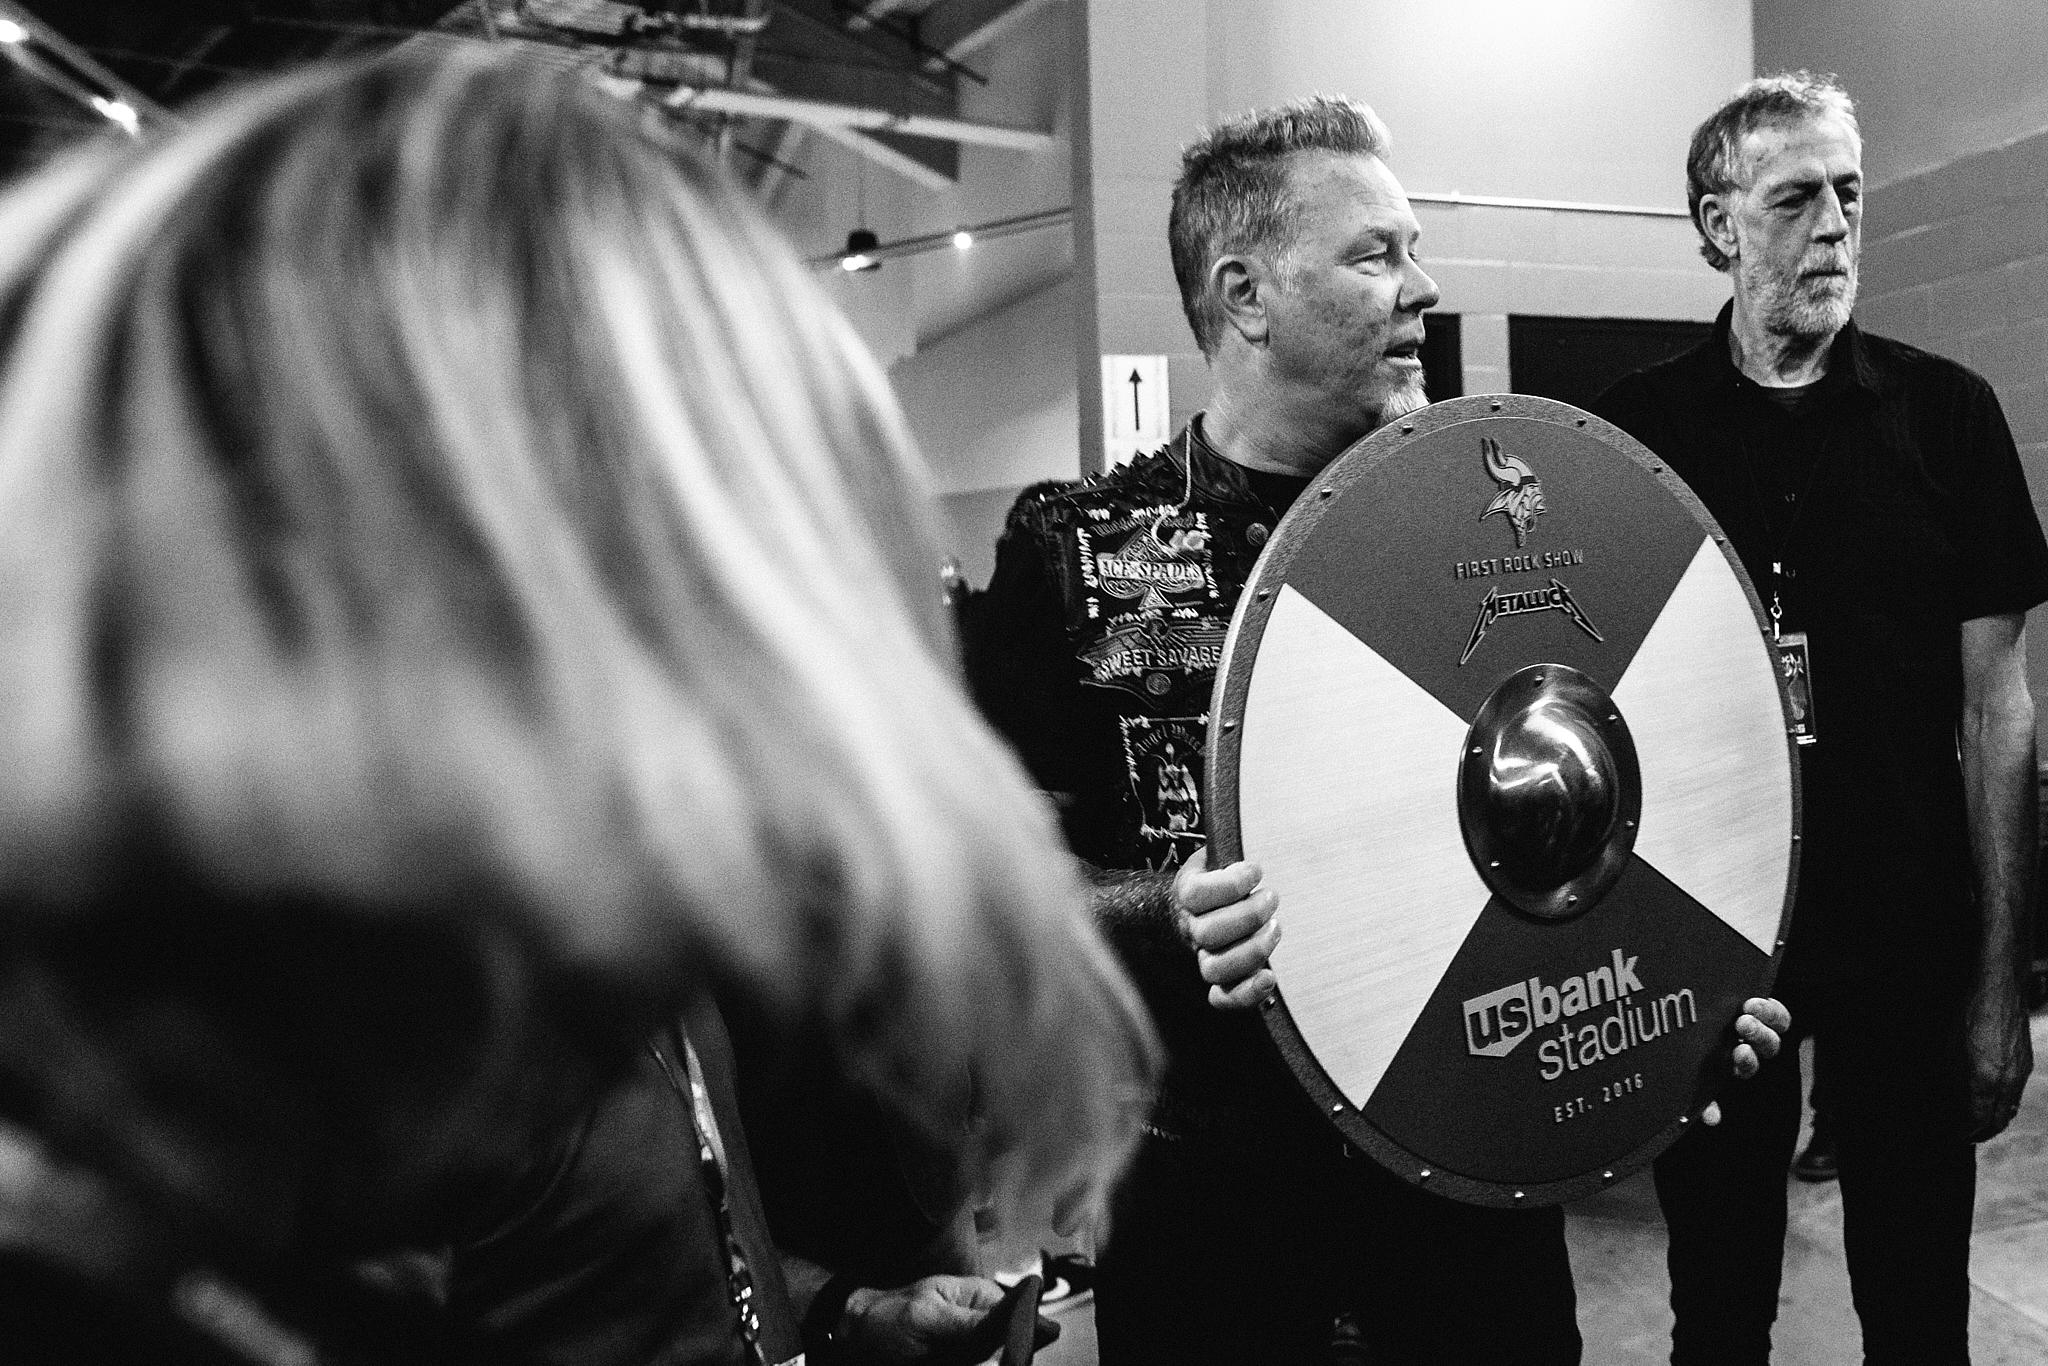 First_Rock_Concert_Metallica_US_Bank_Stadium_Minneapolis_Minnesota_Photography_By_Joe_Lemke_015.JPG